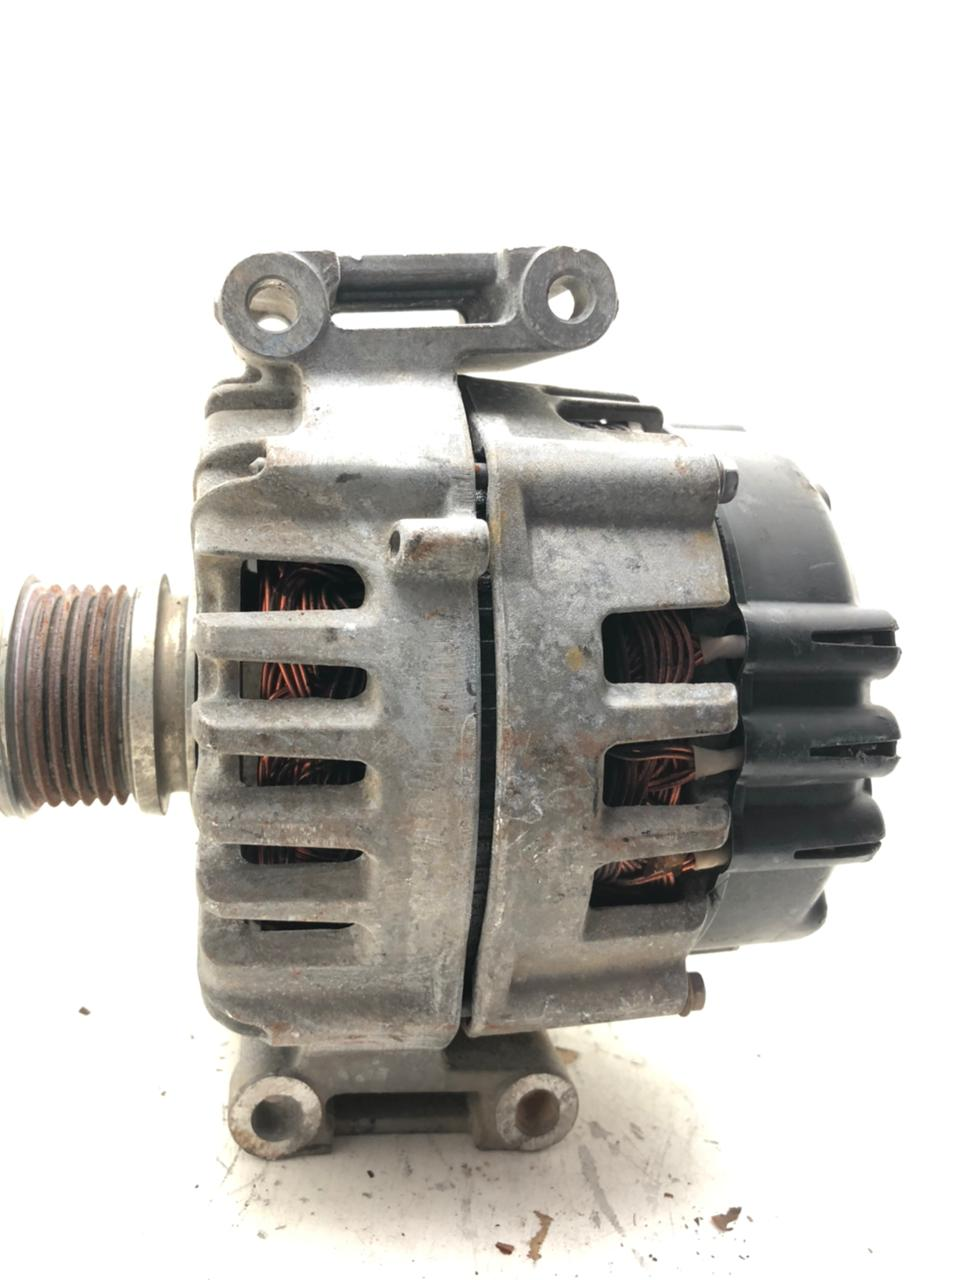 Alternador Sprinter 415 12V 180AMP A0009068802 FGN18S130 2618301C 317038981